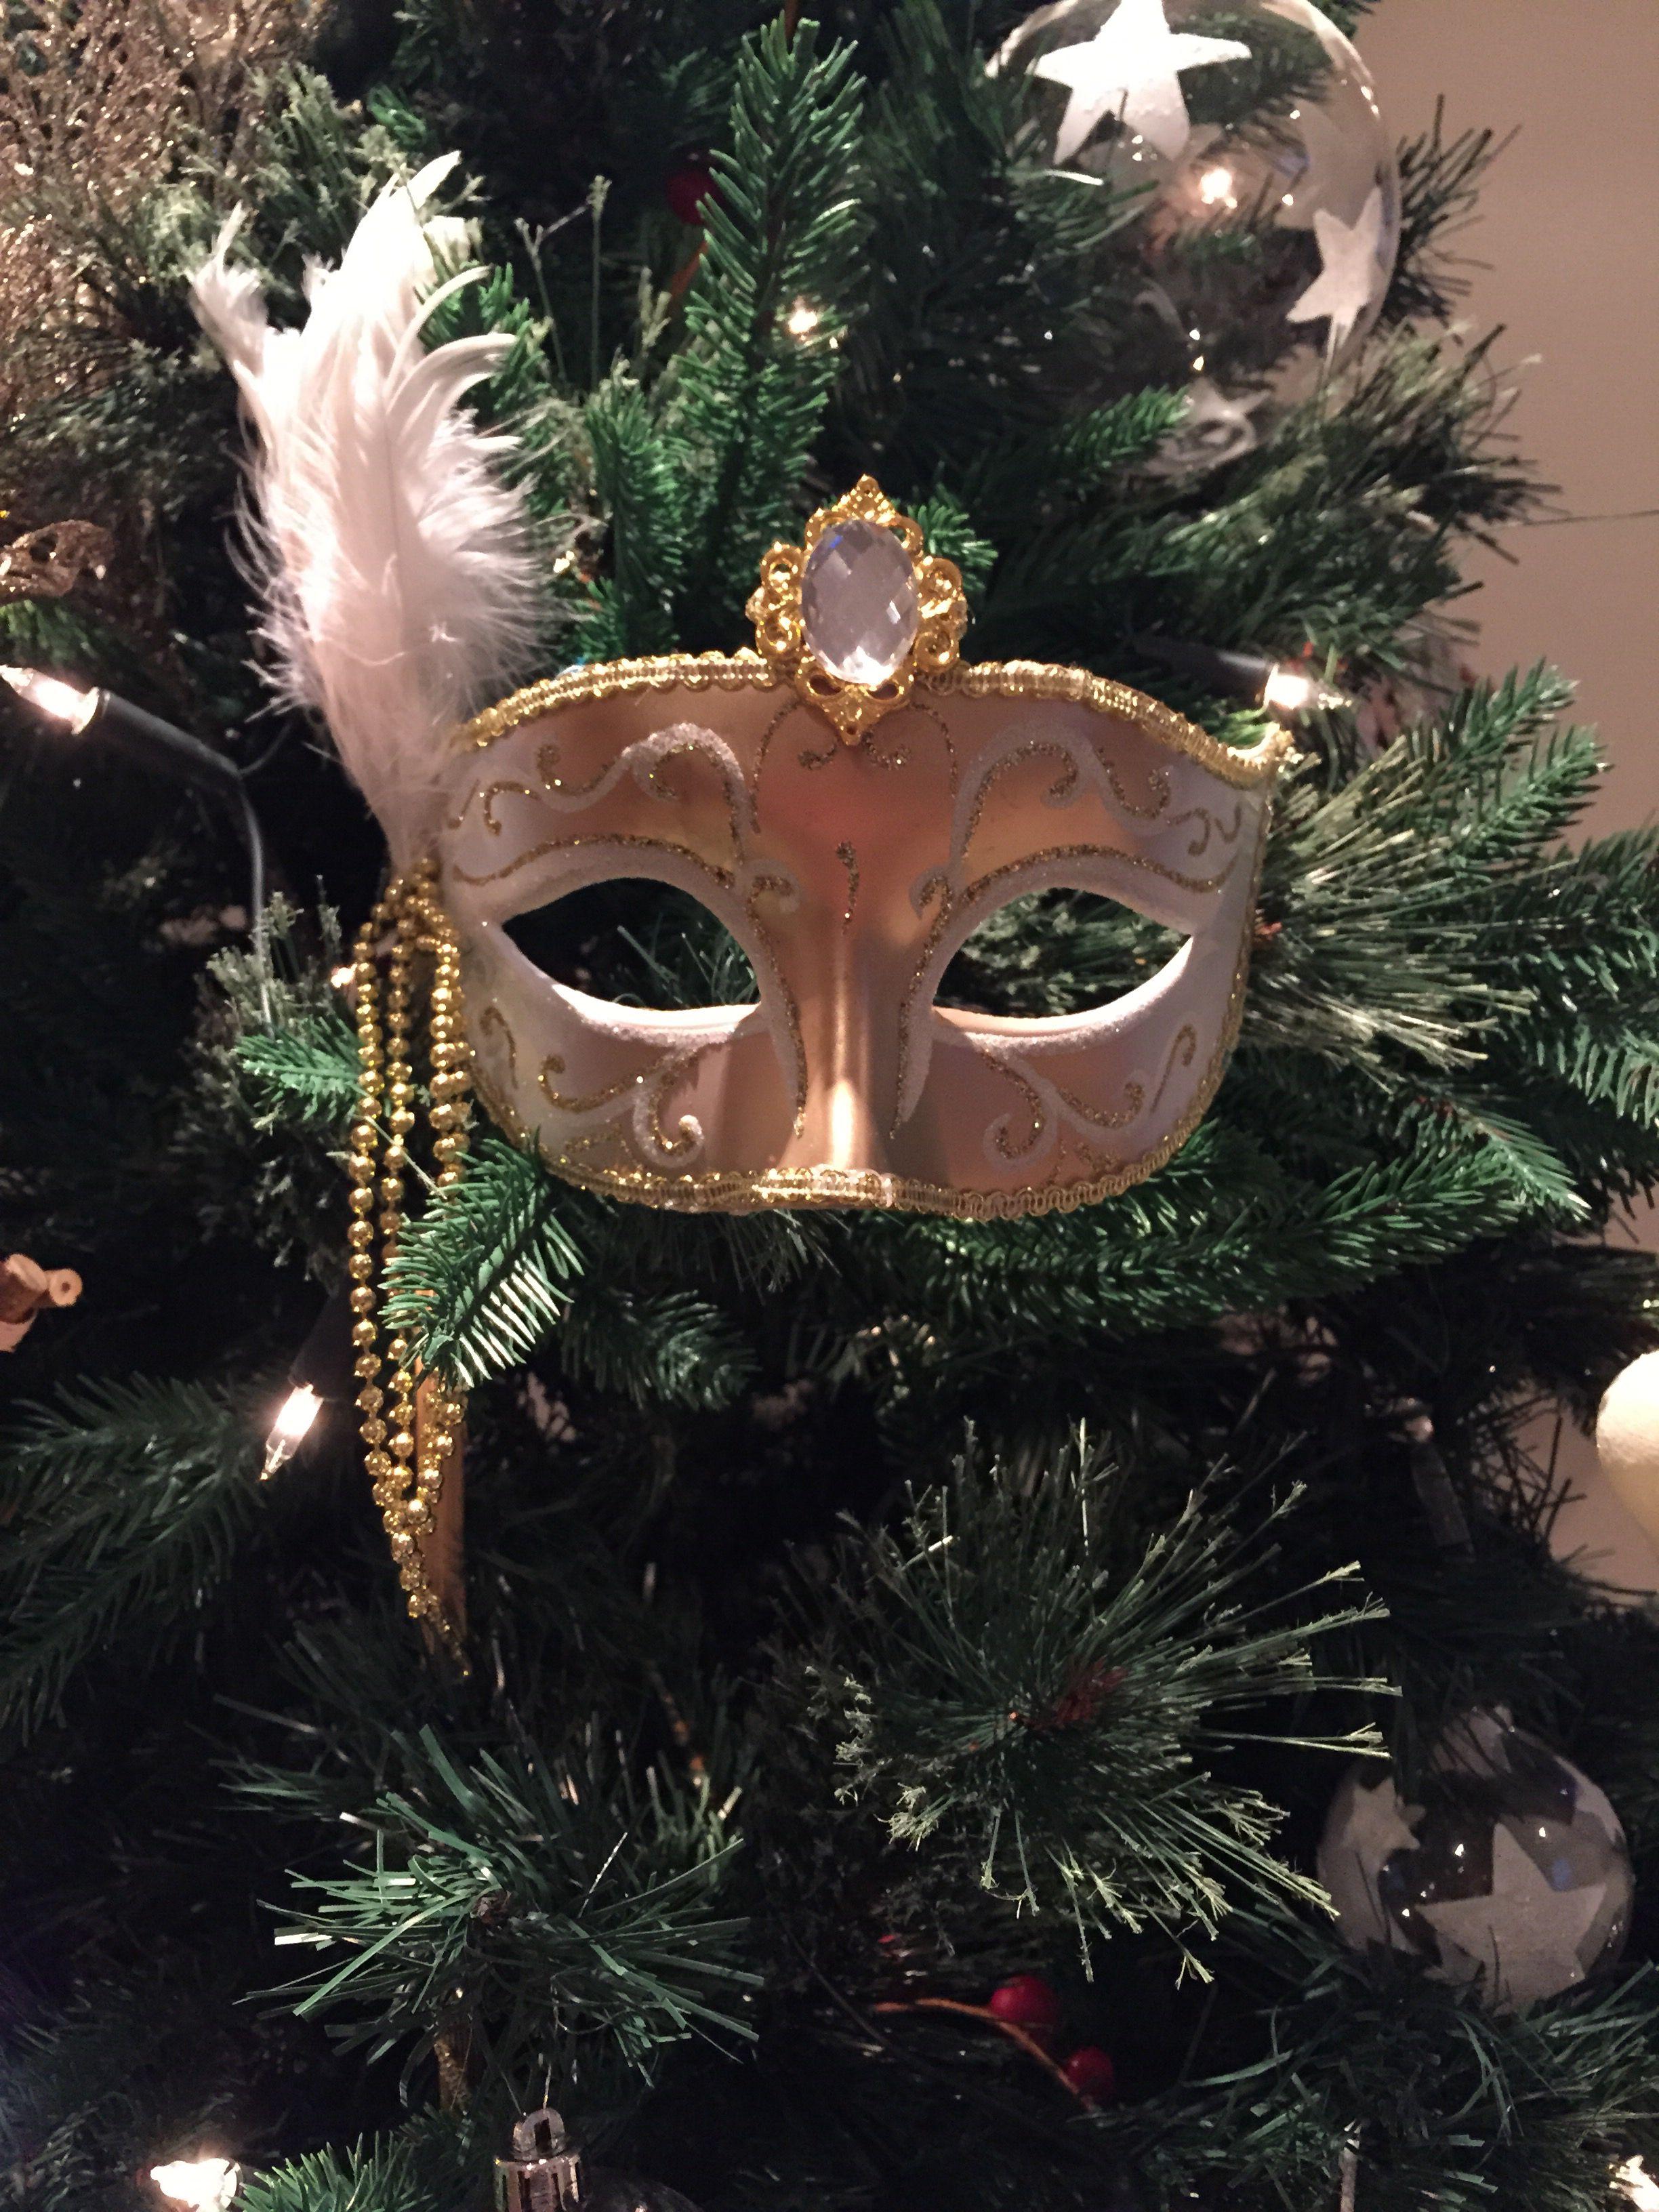 Christmas Masquerade Mask : christmas, masquerade, Christmas, Masquerade, Silver, Sparkle, White, Feather, Ornaments,, Christmas,, Decorations